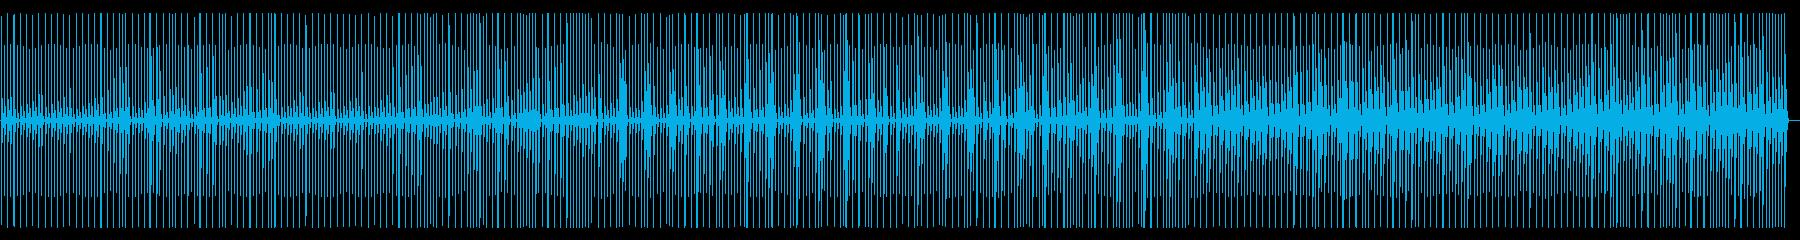 YouTube 木琴ソロ・シンプルの再生済みの波形